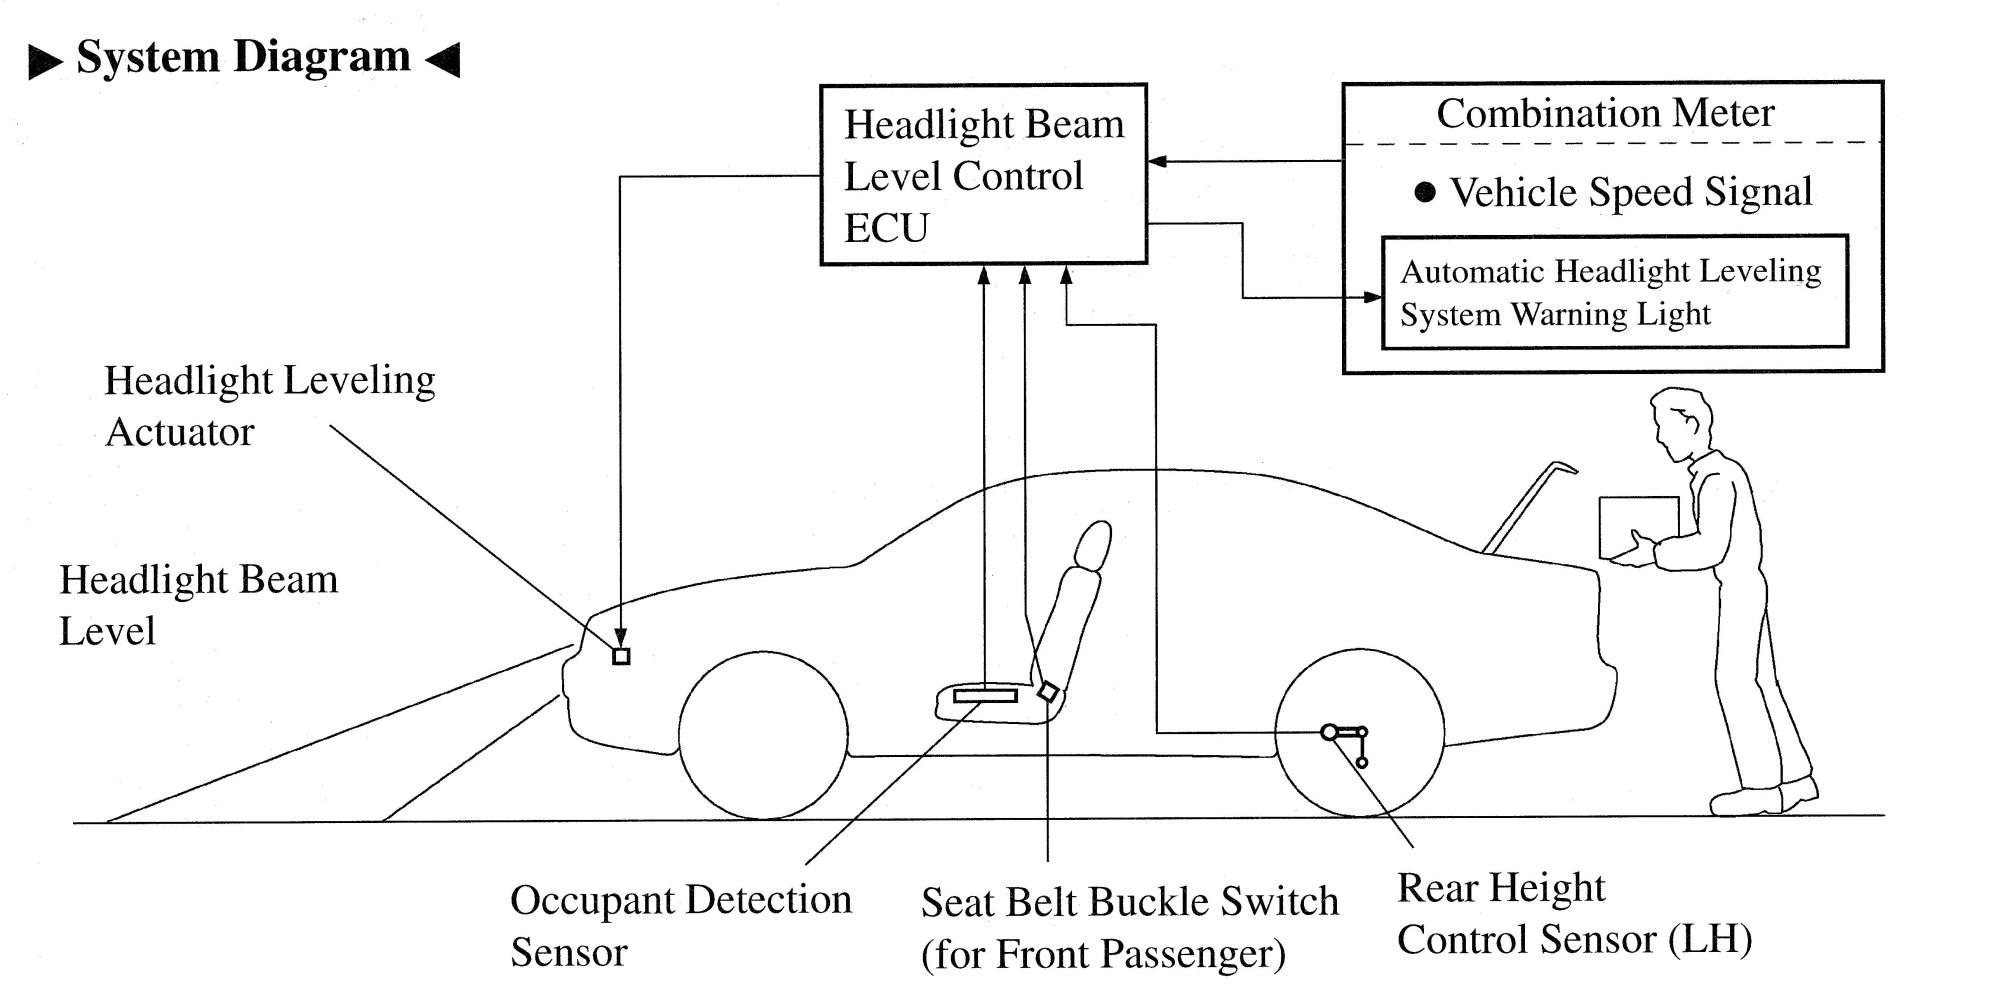 hight resolution of 02 toyota tacoma engine diagram wiring library02 toyota tacoma engine diagram